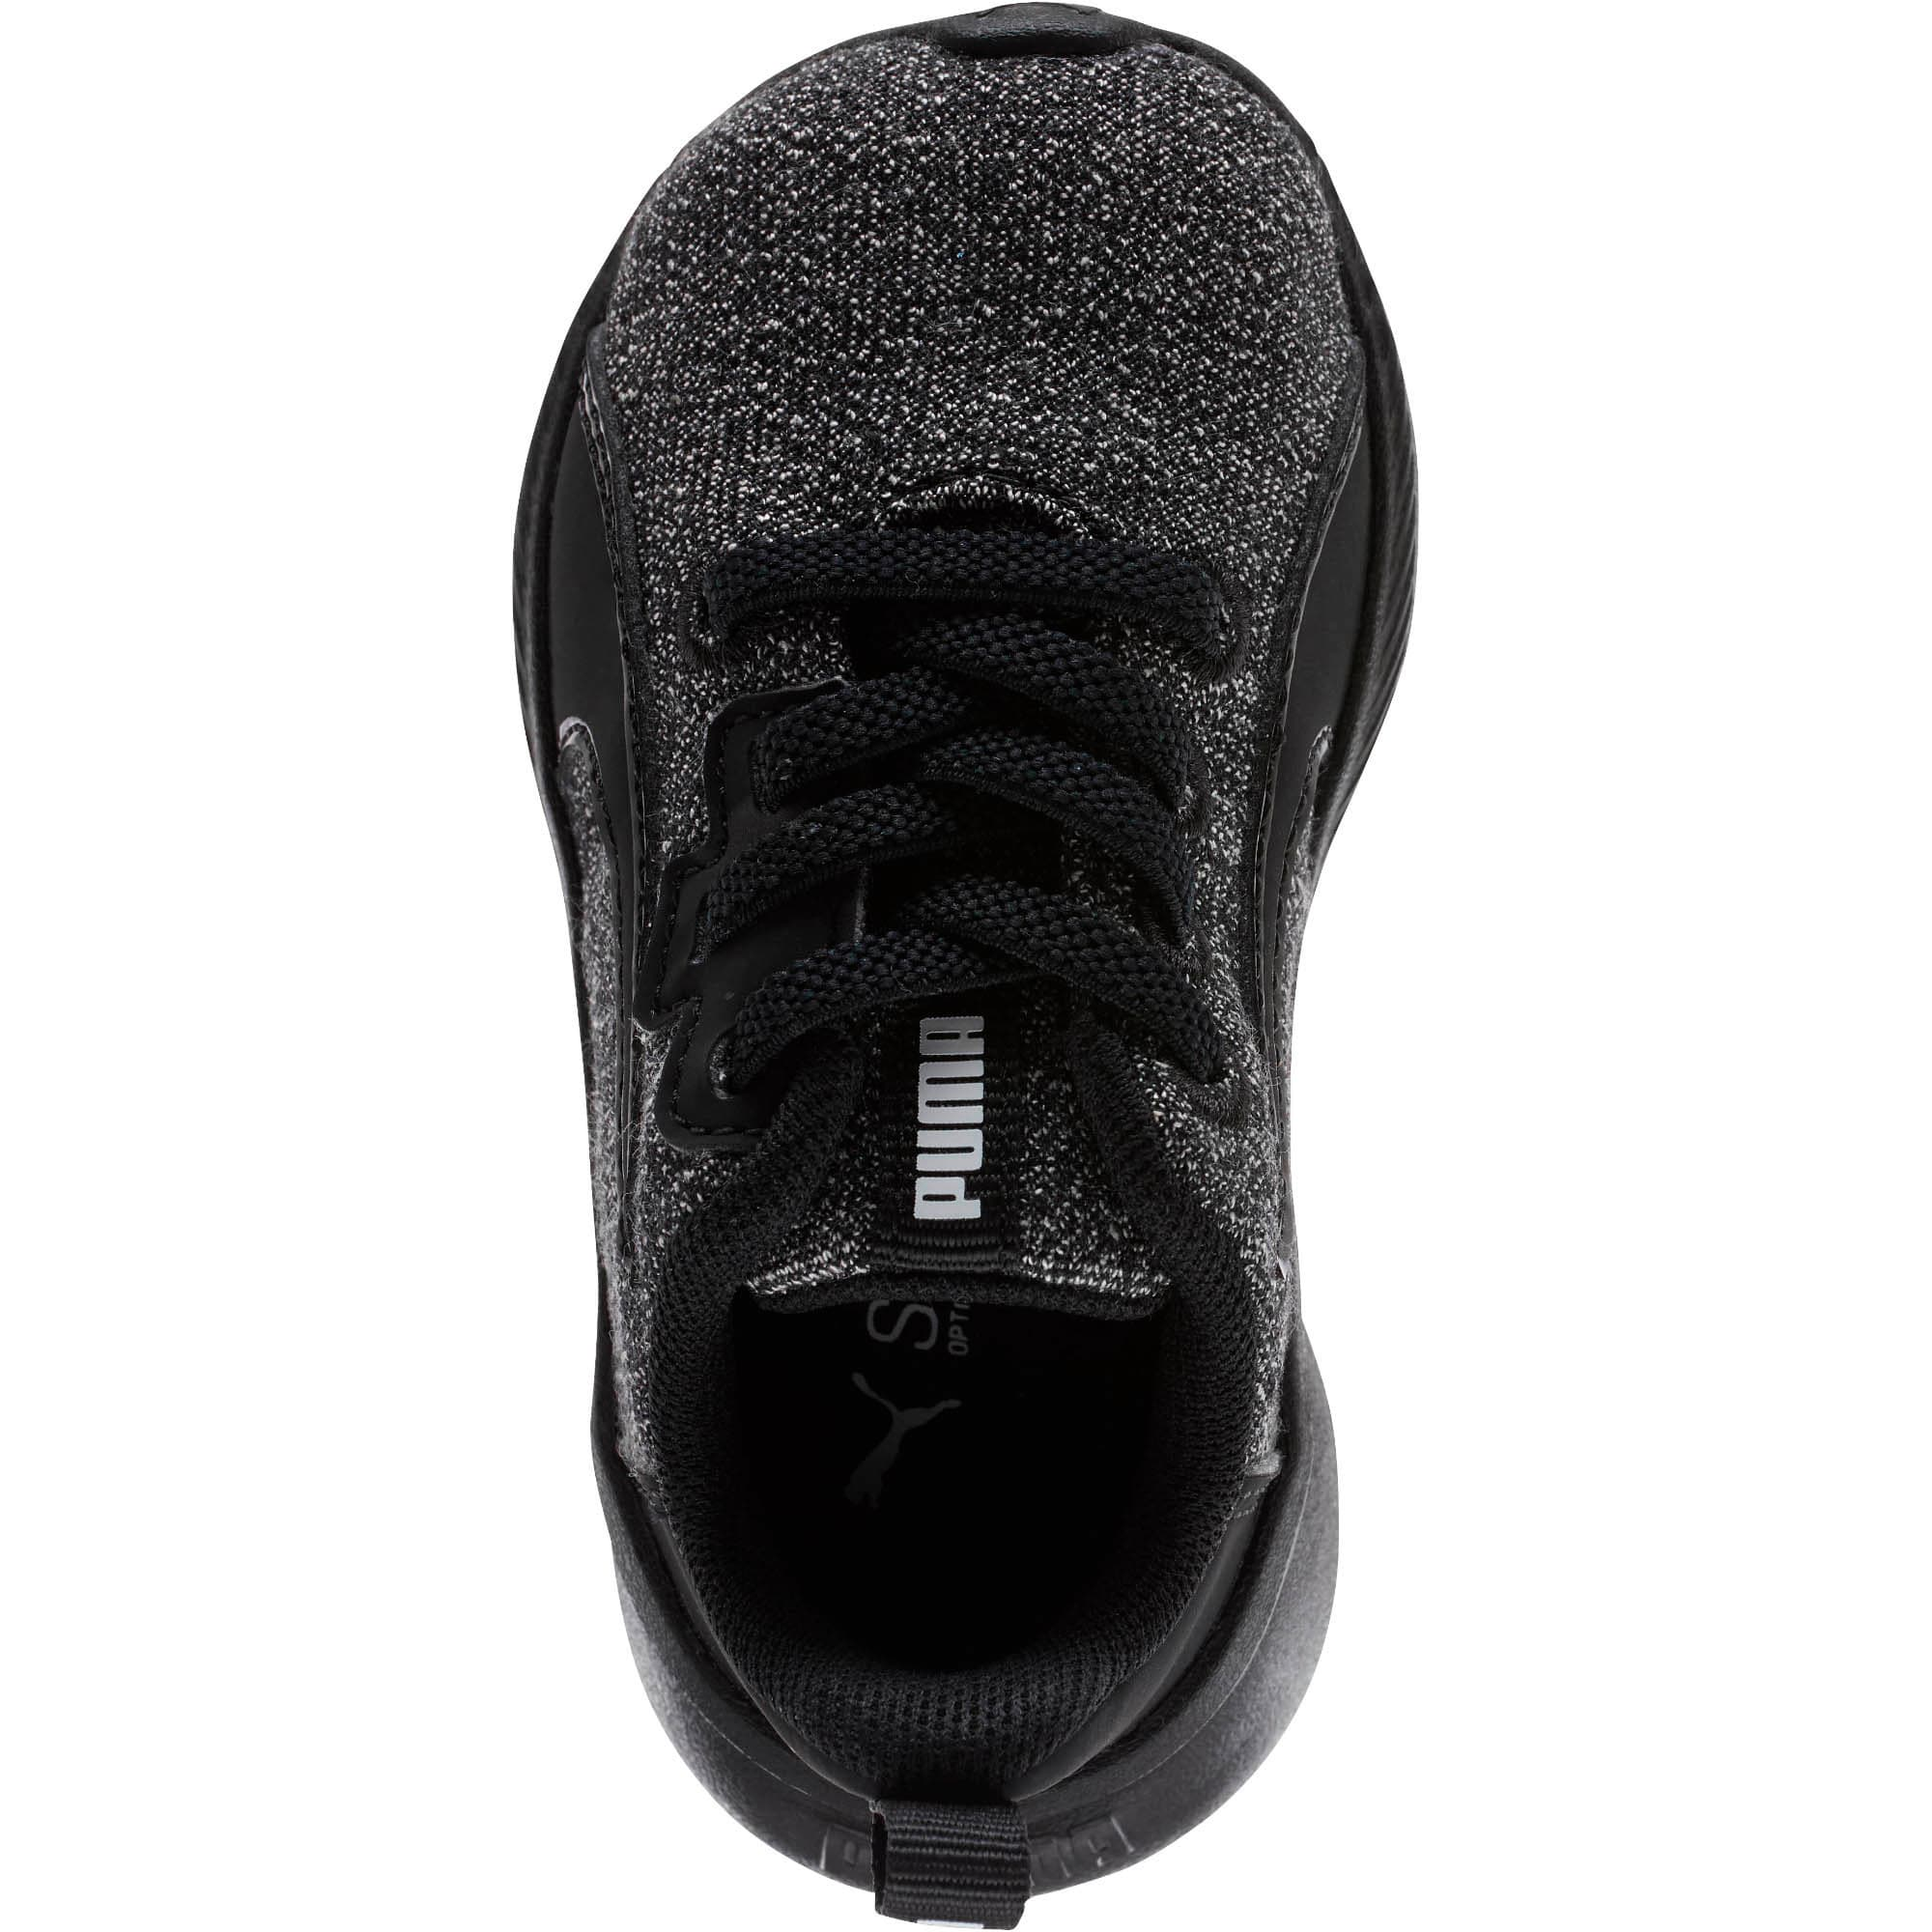 Thumbnail 5 of Tishatsu Runner Knit Toddler Shoes, Puma Black-Puma White, medium